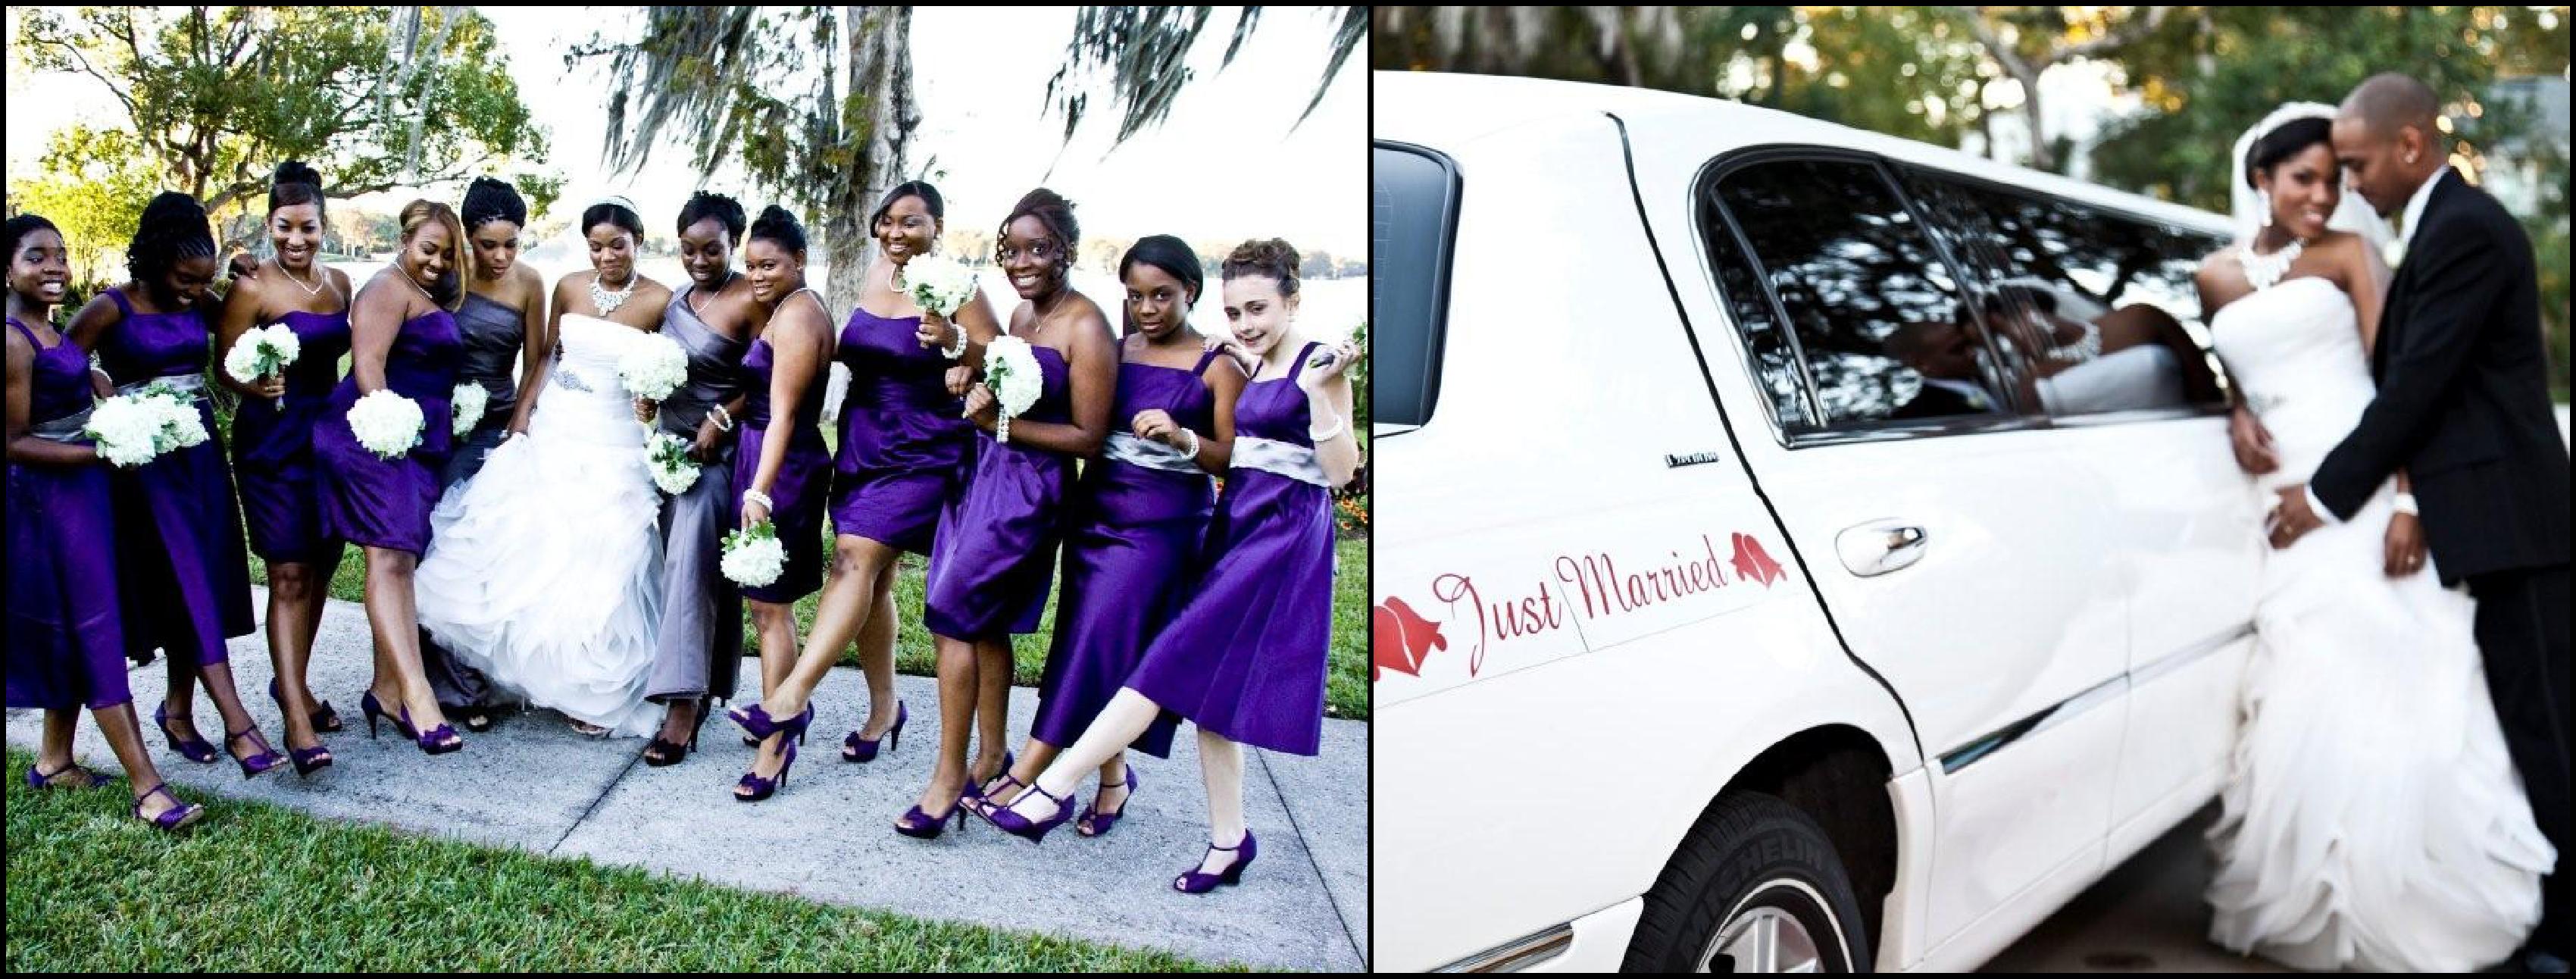 Bridesmaid Dresses Nj